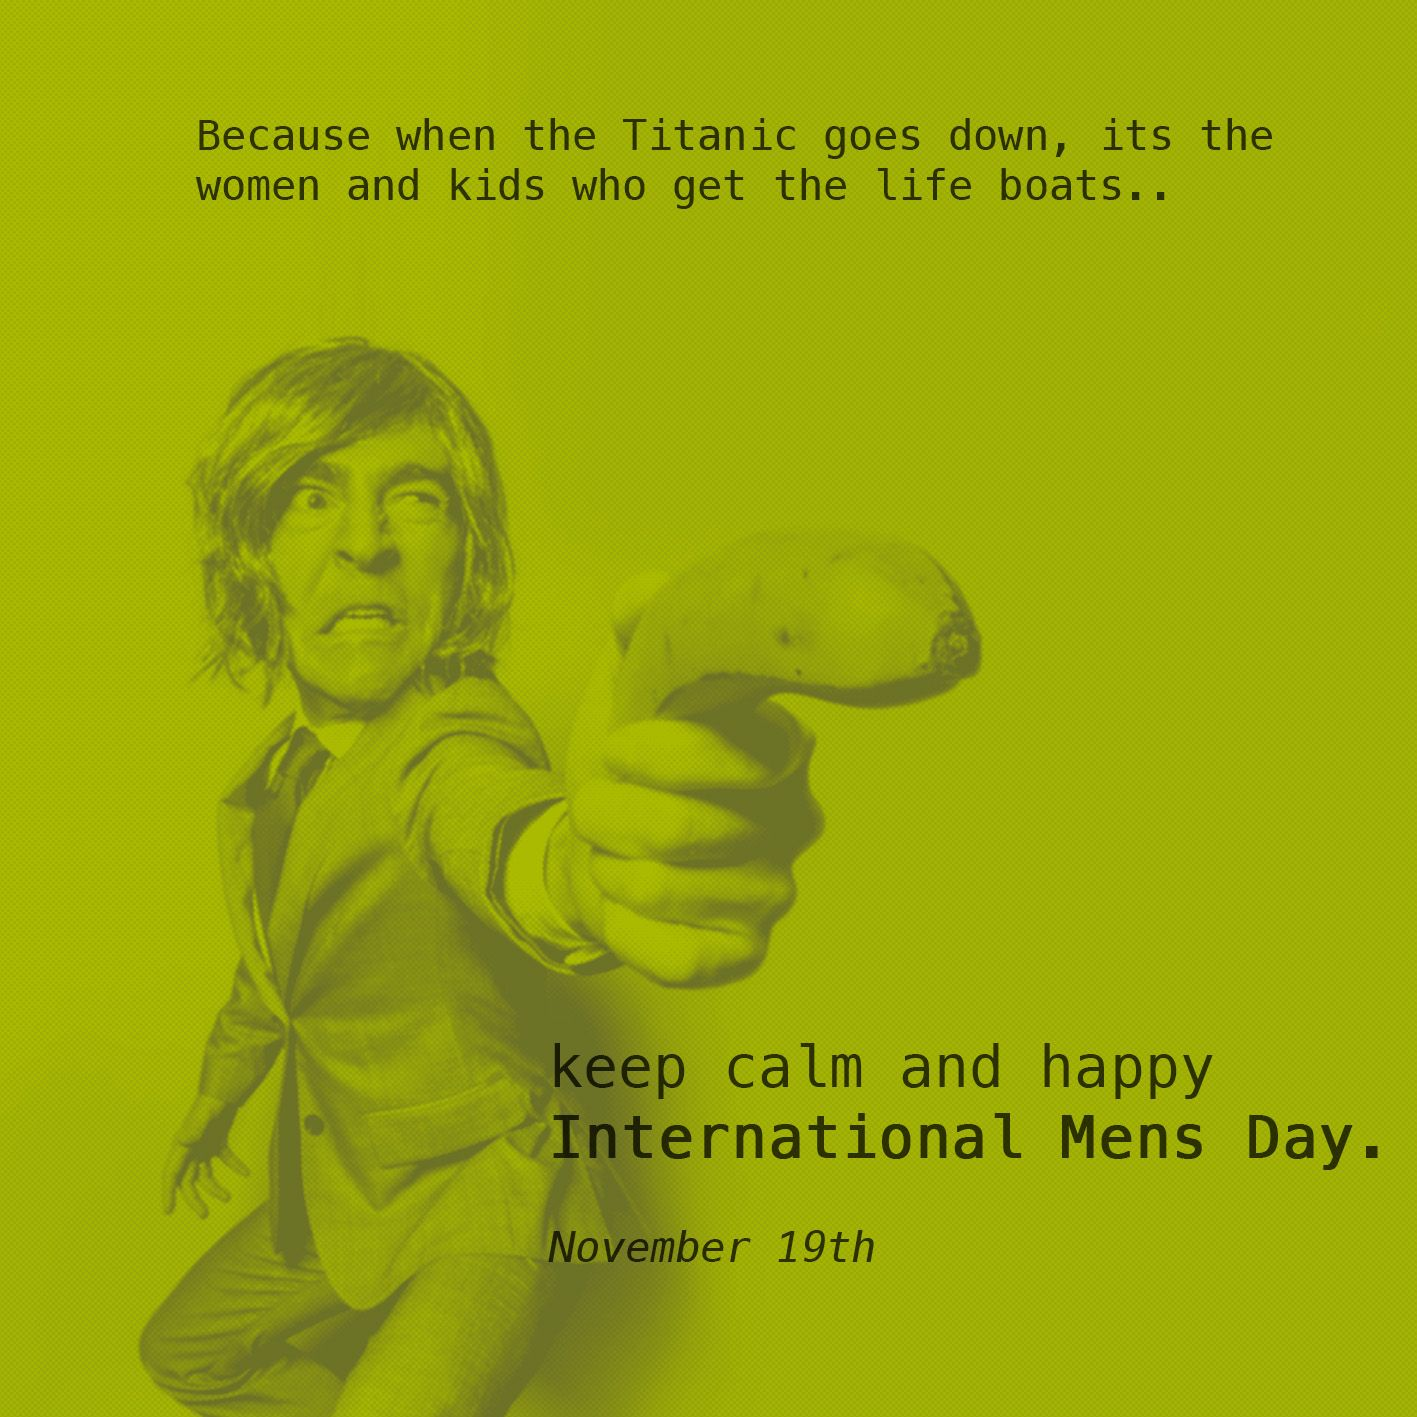 International Mens Day November 19th Nov19 Himtoo Mensday Internationalmensday International Men S Day Happy International Men S Day Men S Day Quotes